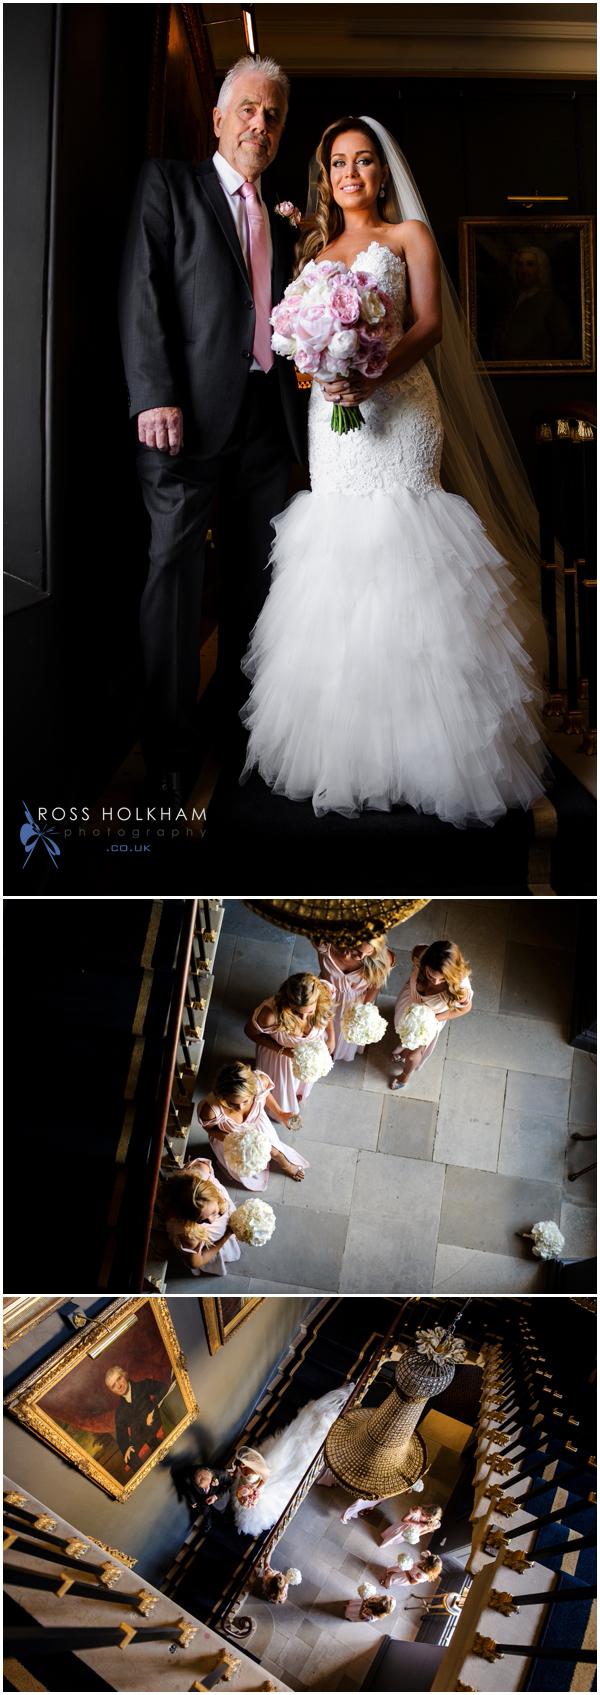 Stubton Hall Wedding Ross Holkham Photography Amy and Ross-020